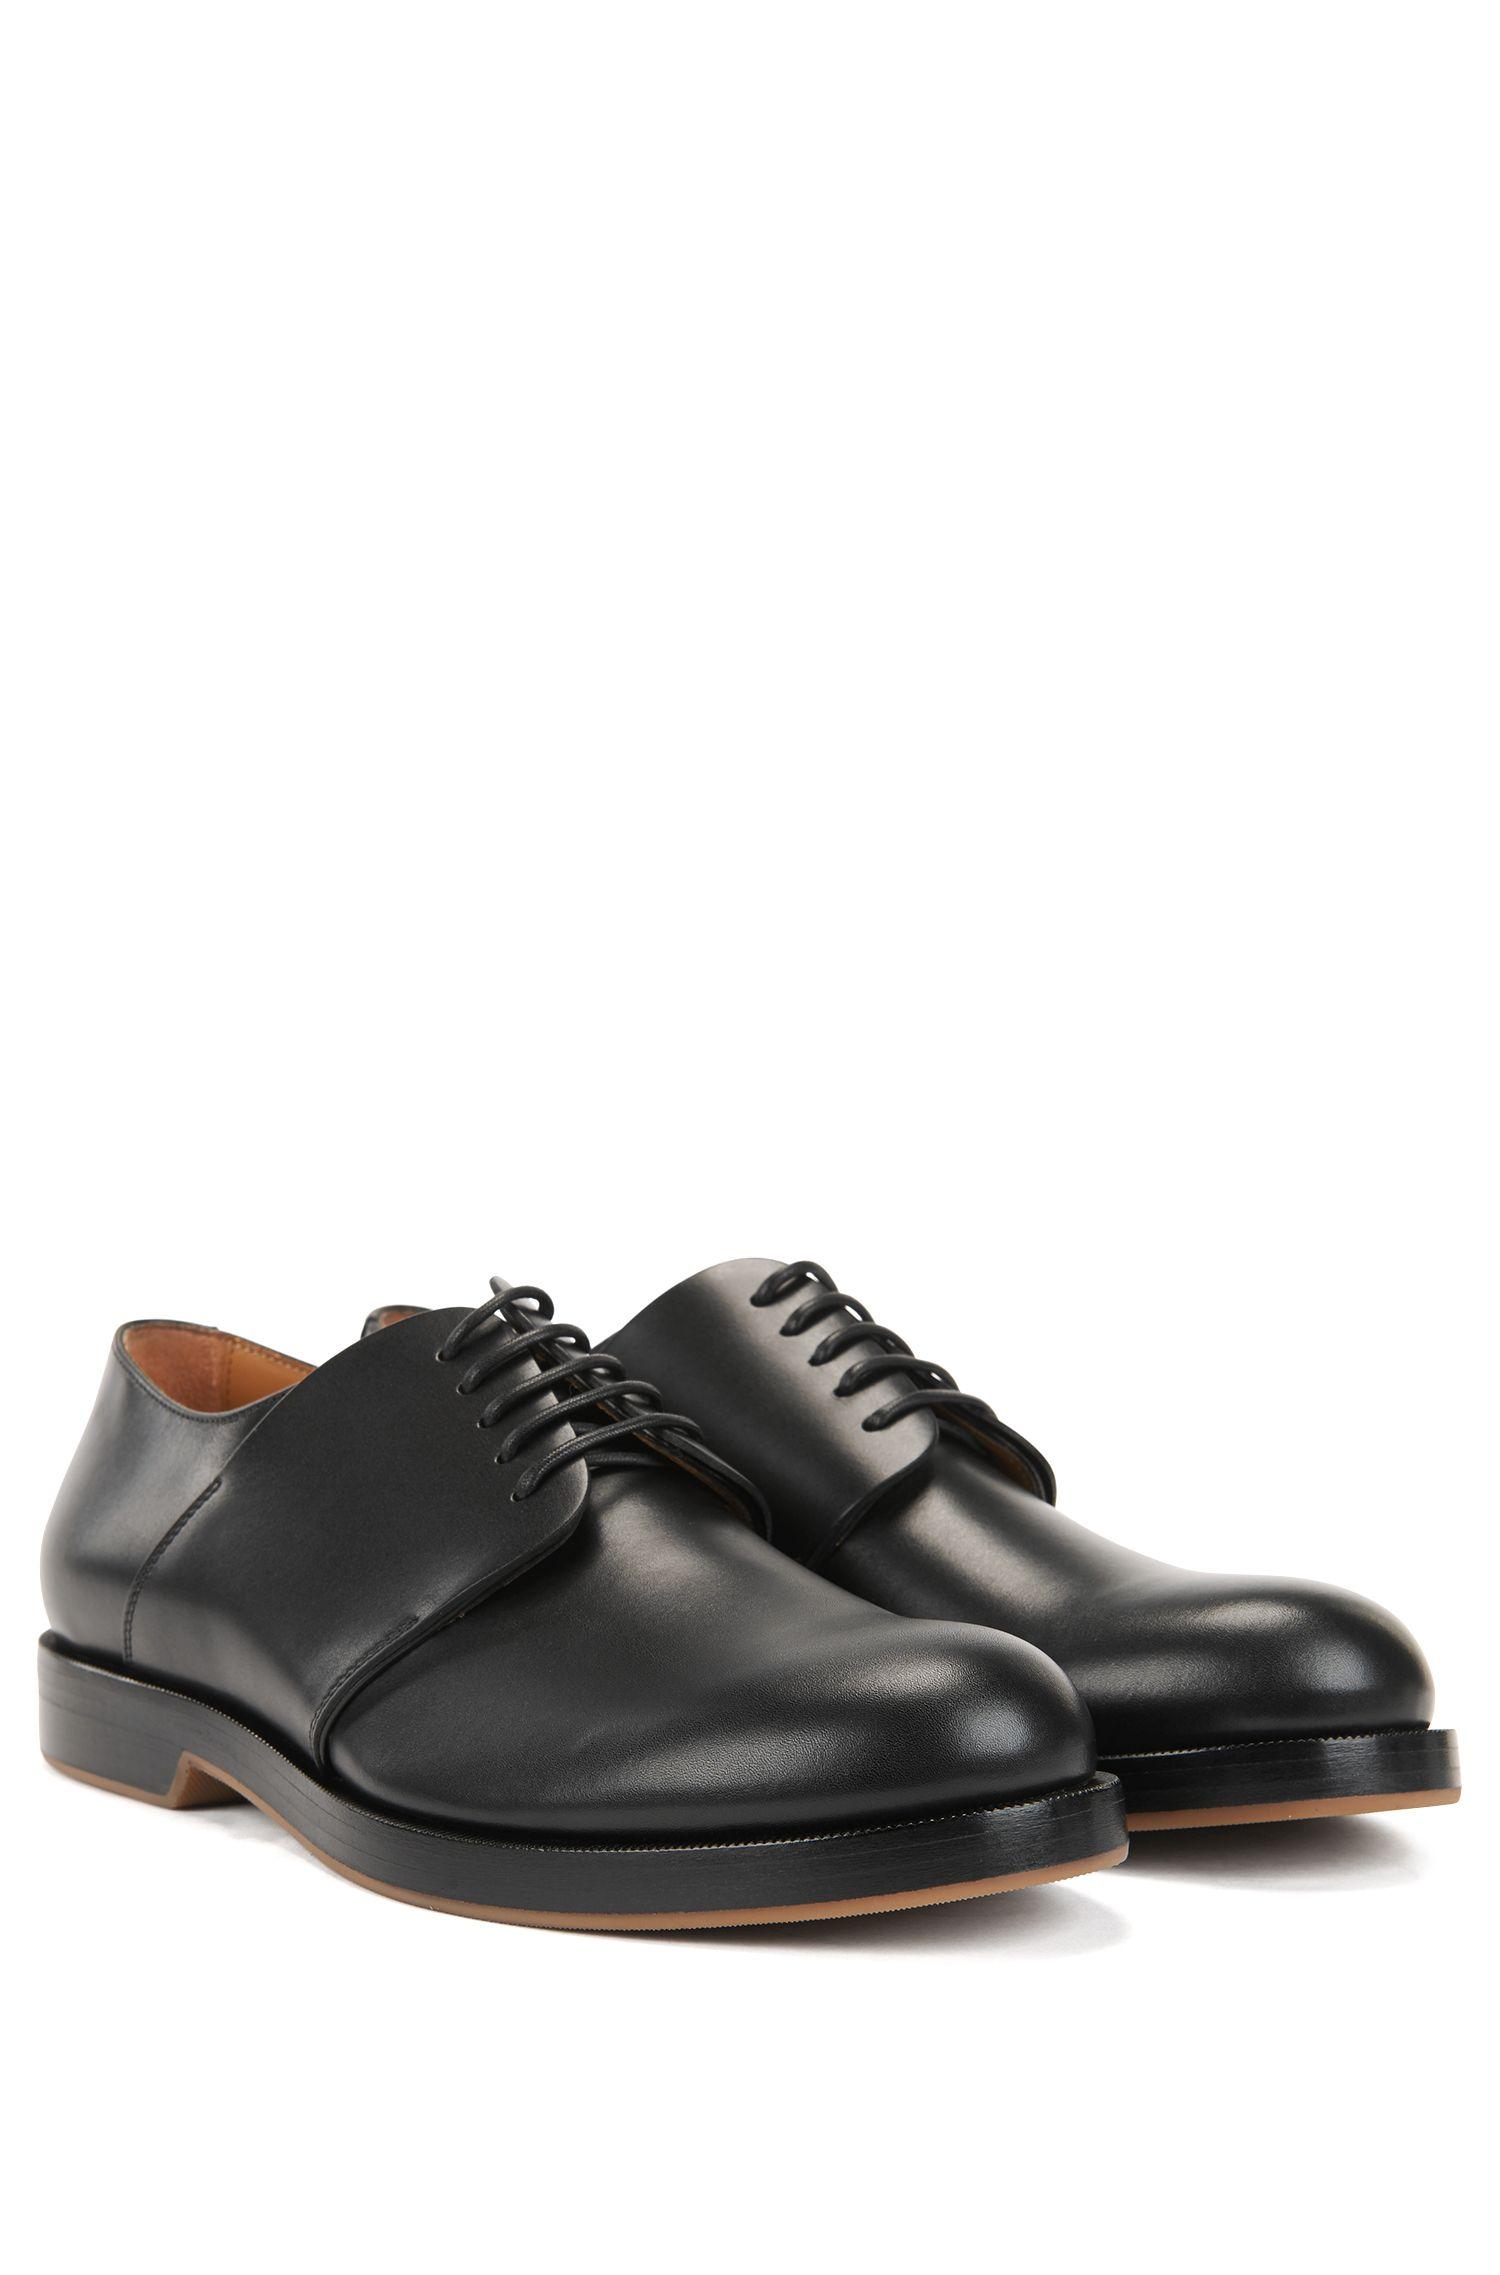 Chaussures derby en cuir395.00BOSS